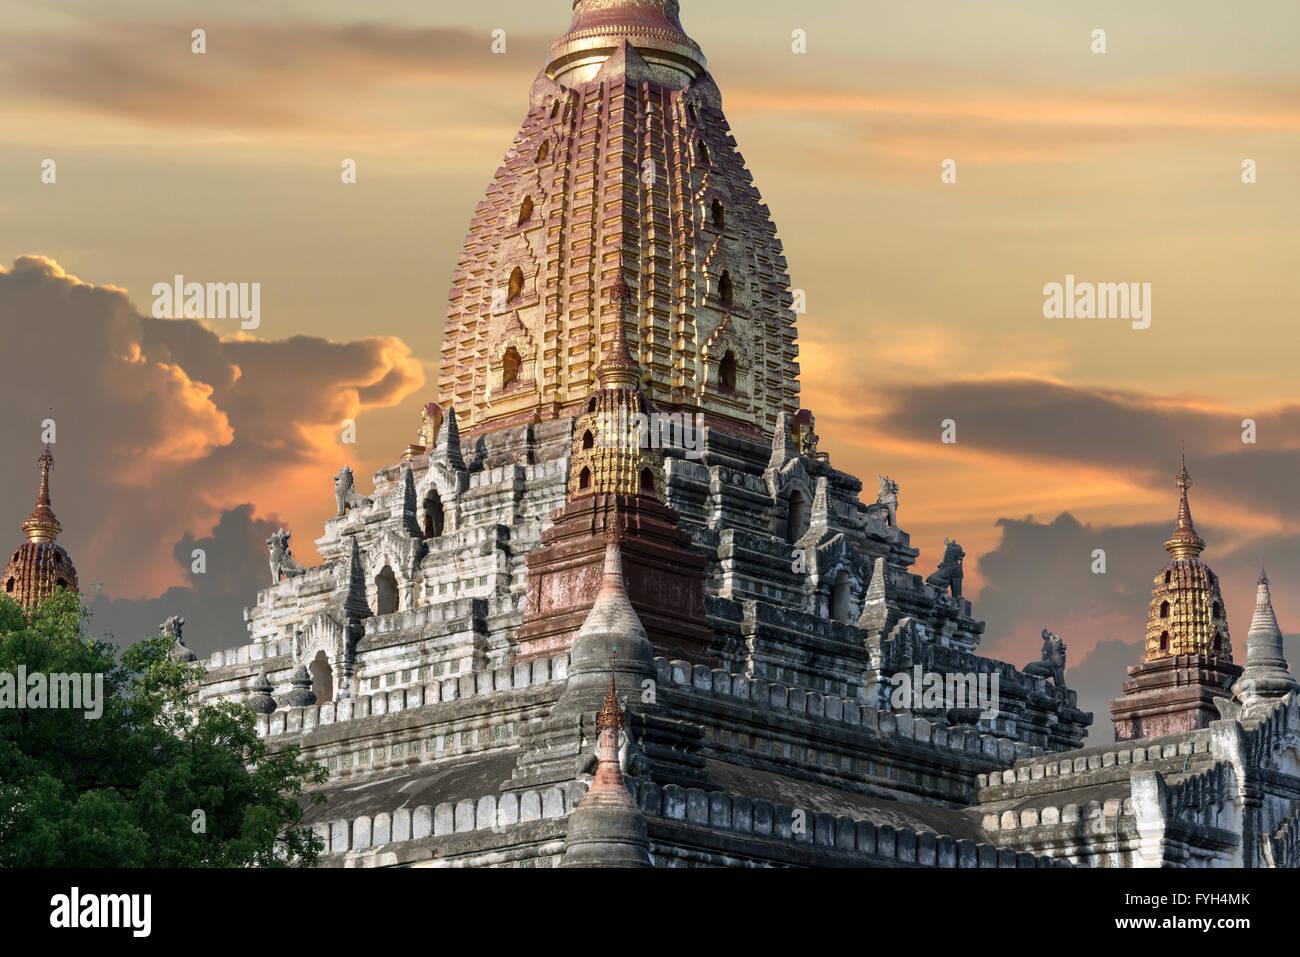 Ananda temple at sunset, Old Bagan, Myanmar - Stock Image